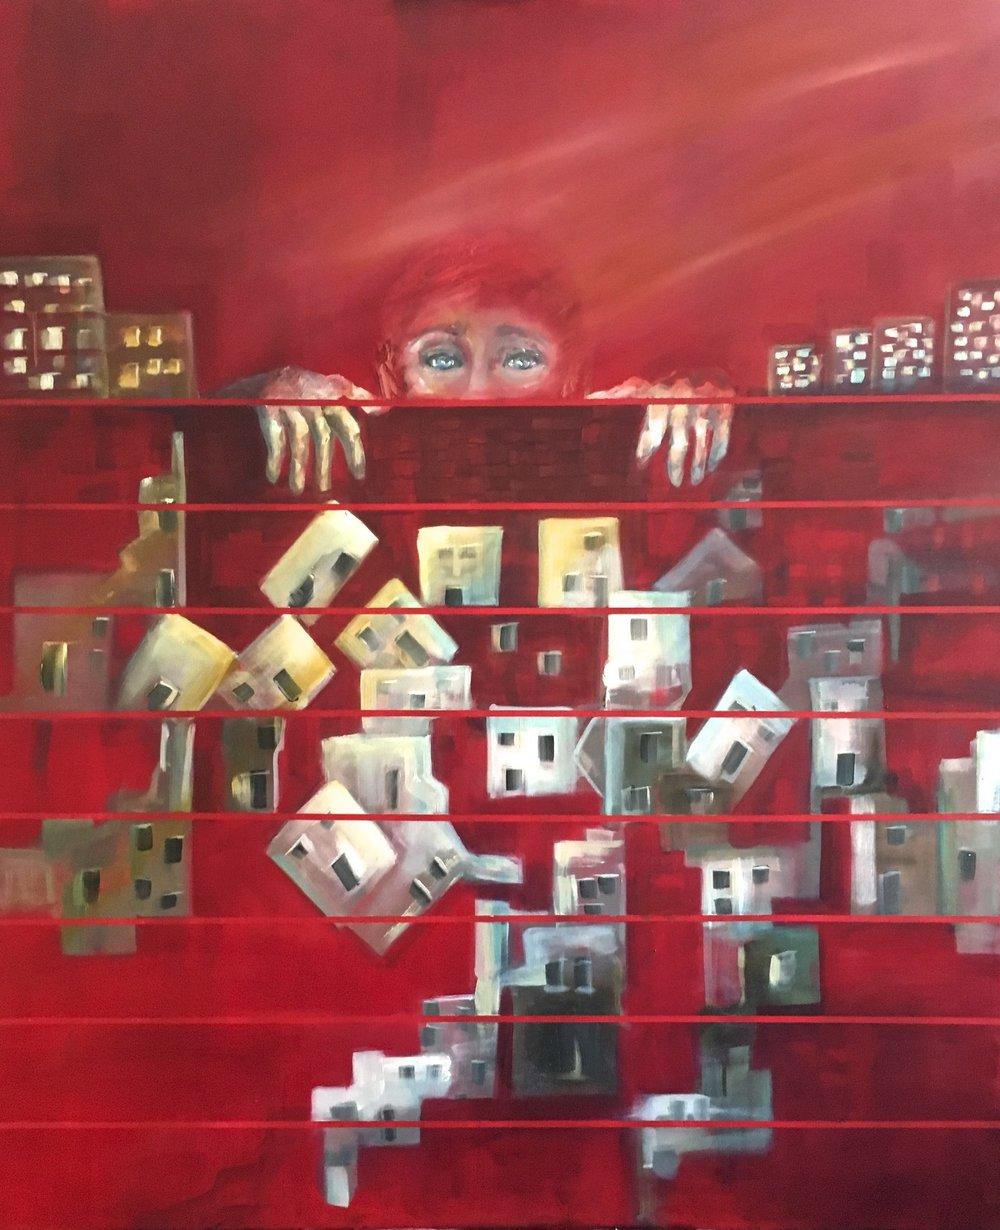 Fire Wall  /Oil on linen  120 x 100 cm  2016